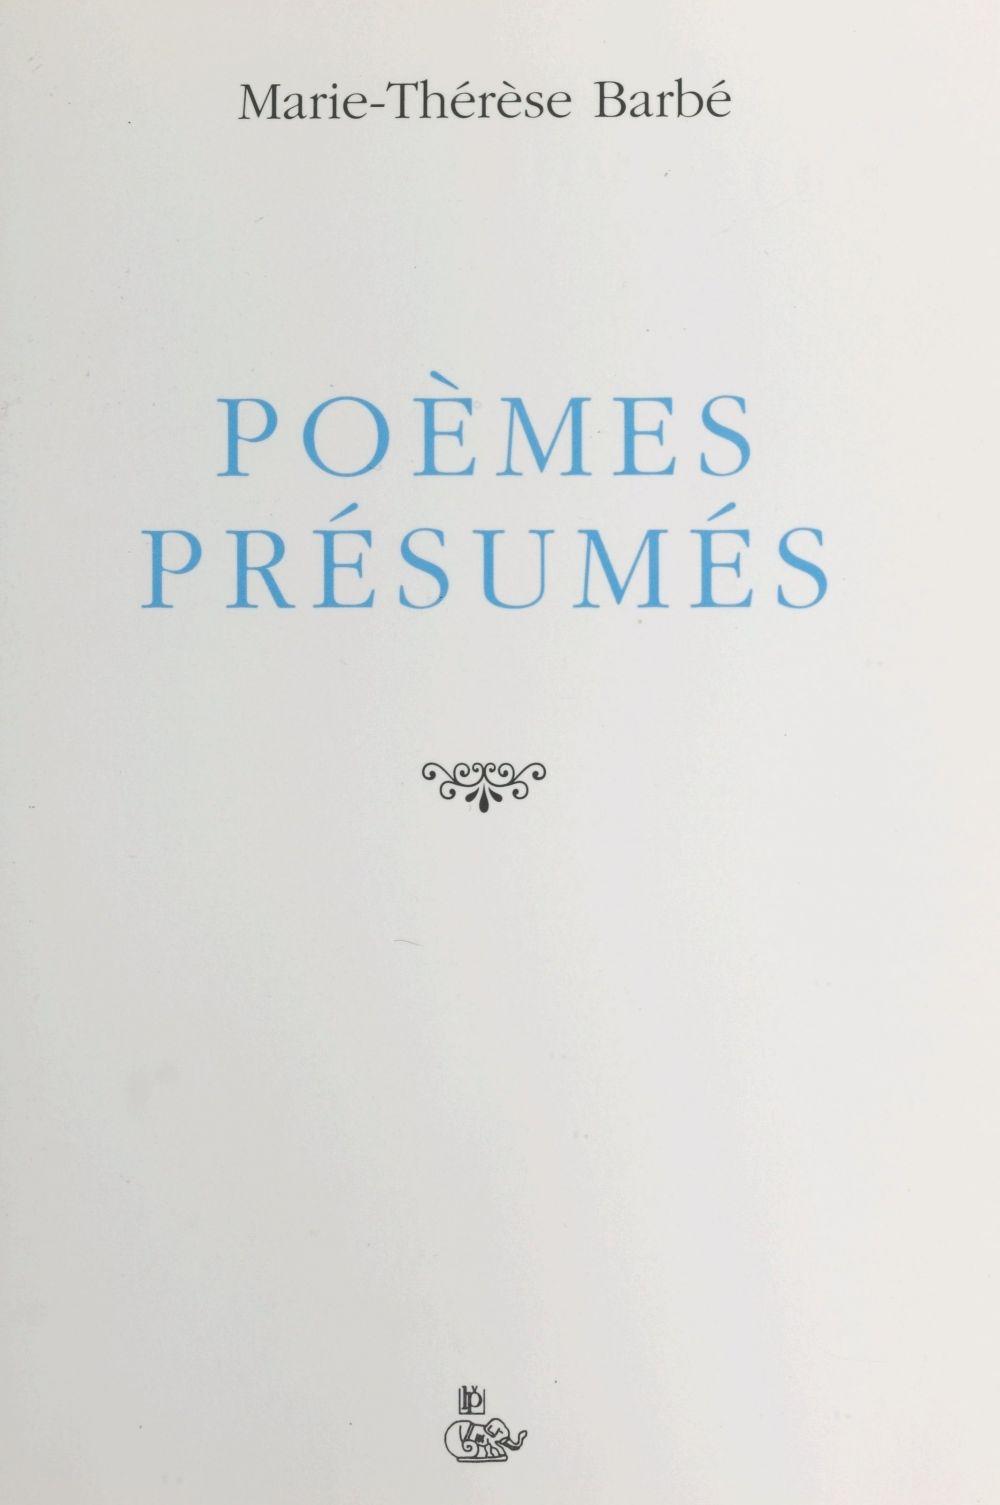 Poemes presumes